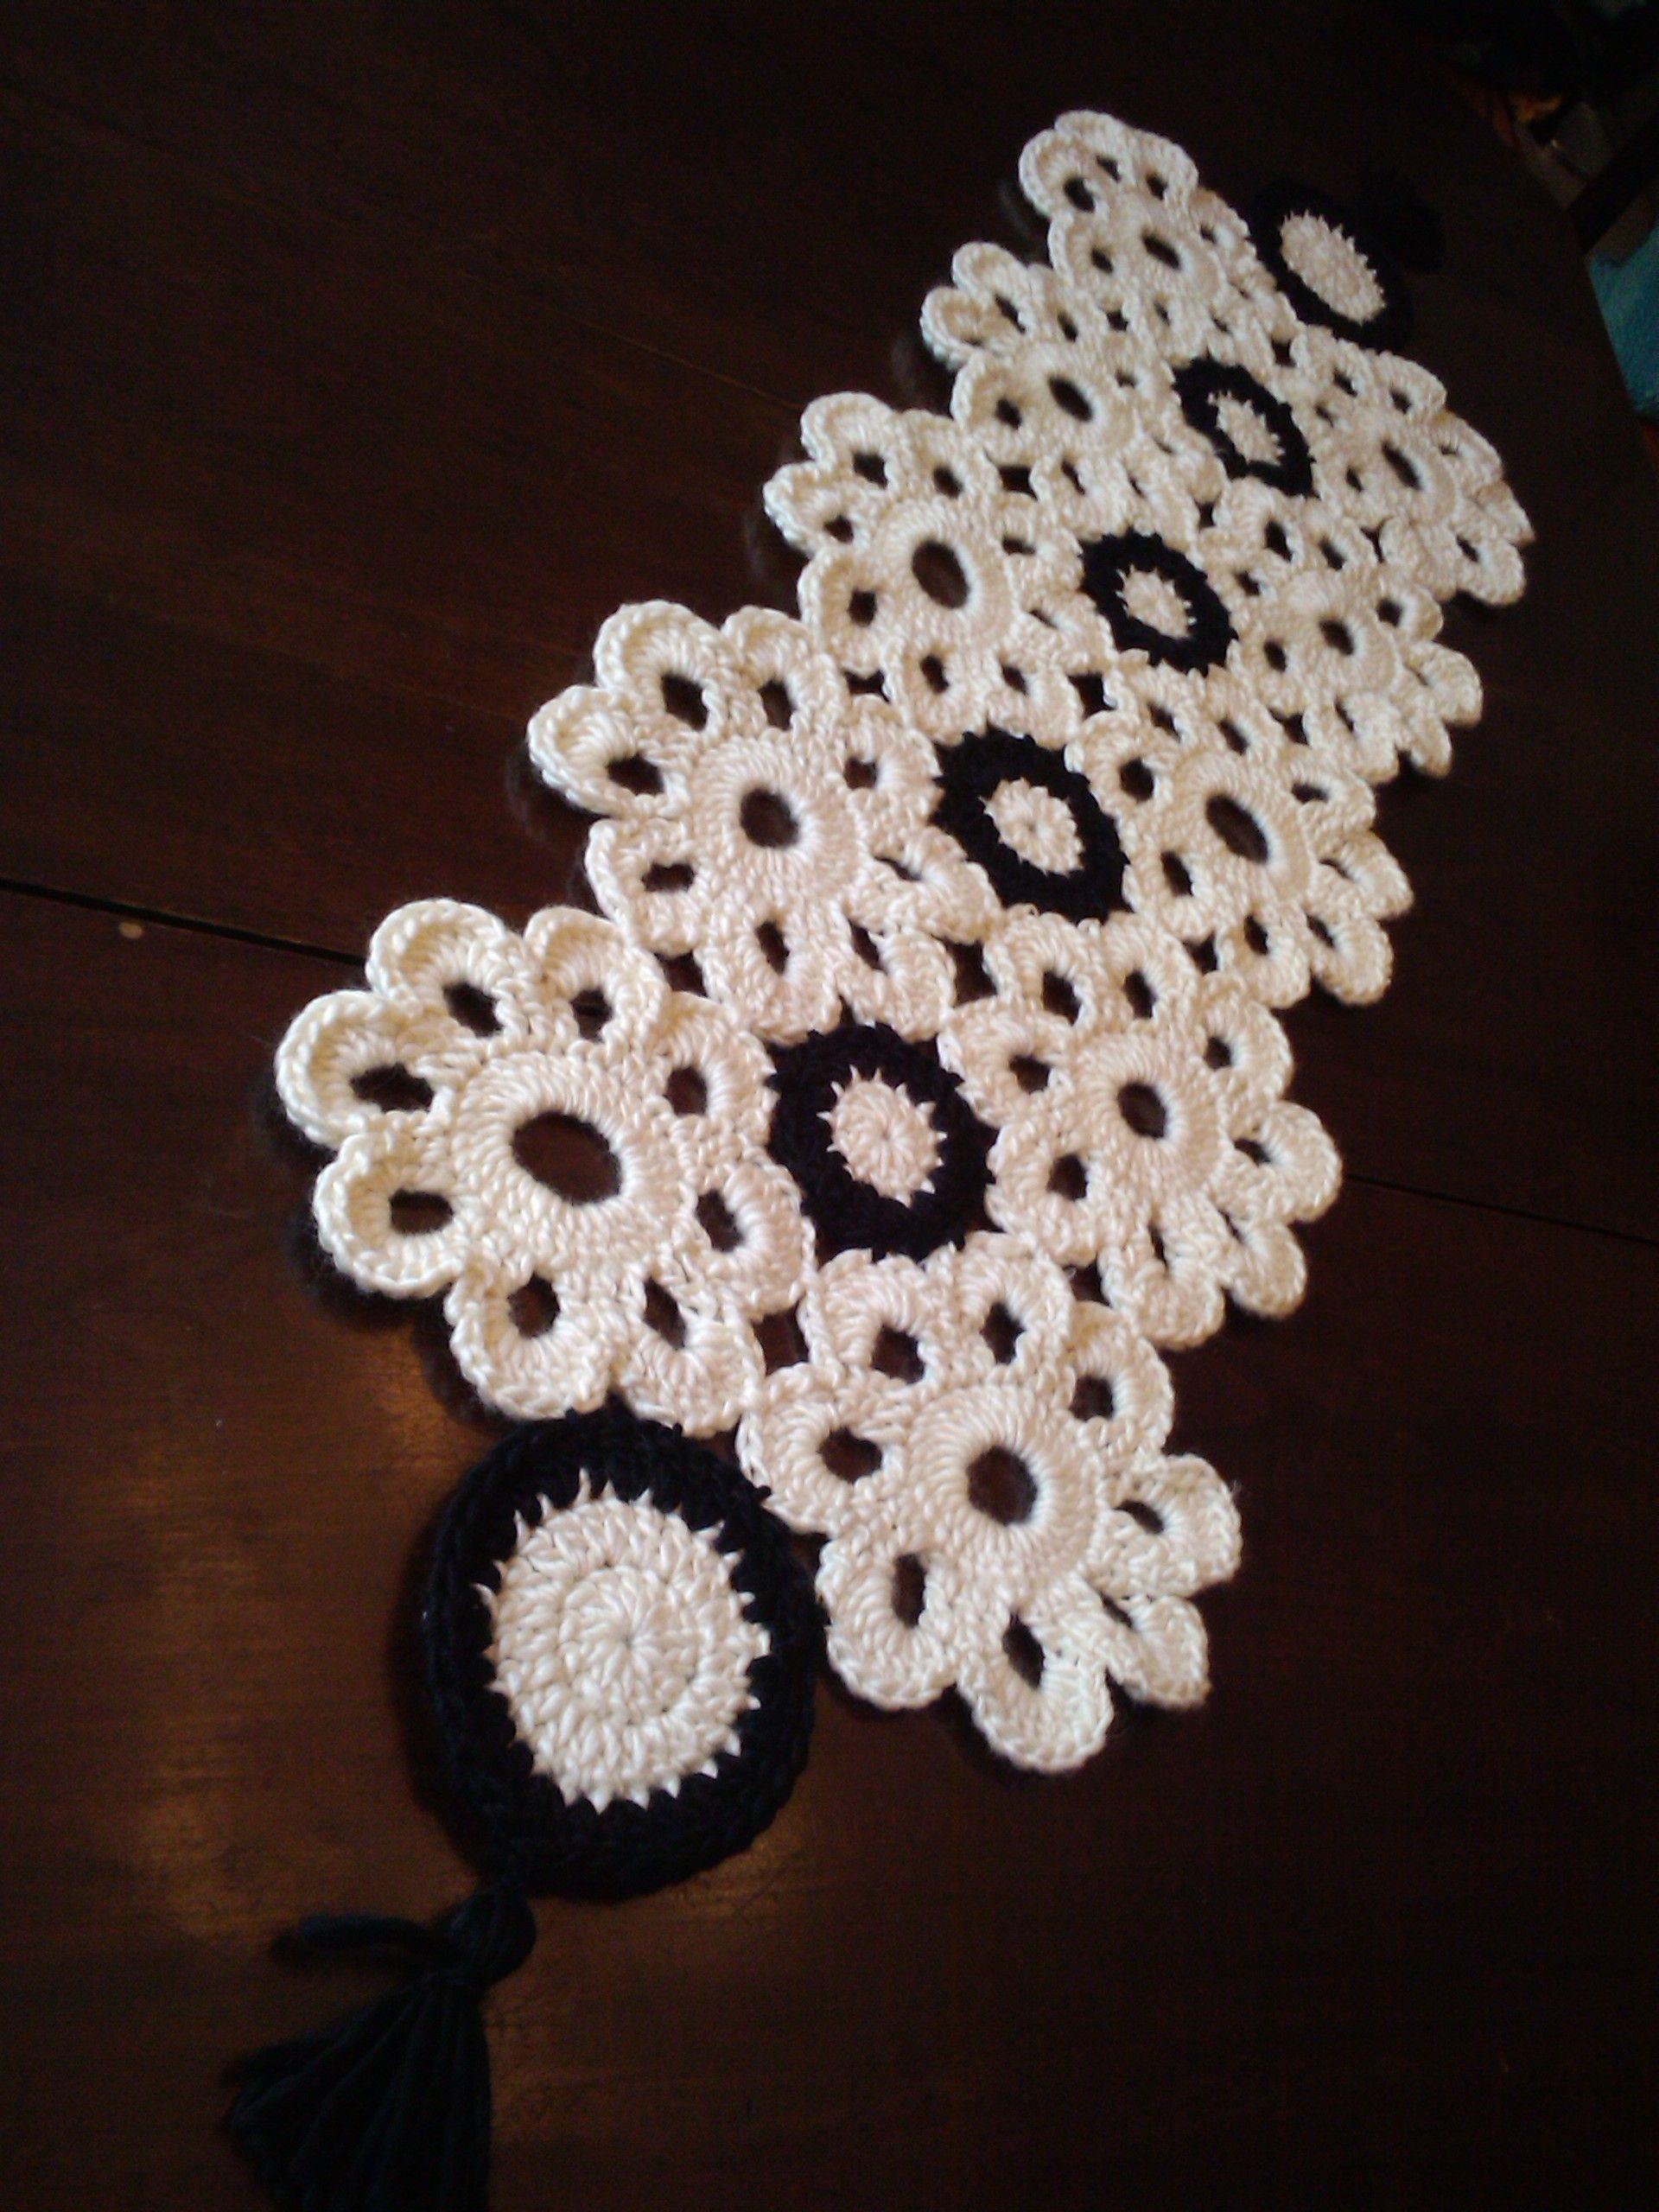 Mesa De Tapetes De Crochet Pictures To Pin On Pinterest Thepinsta -> Tapetes Para Sala Tejidos A Crochet